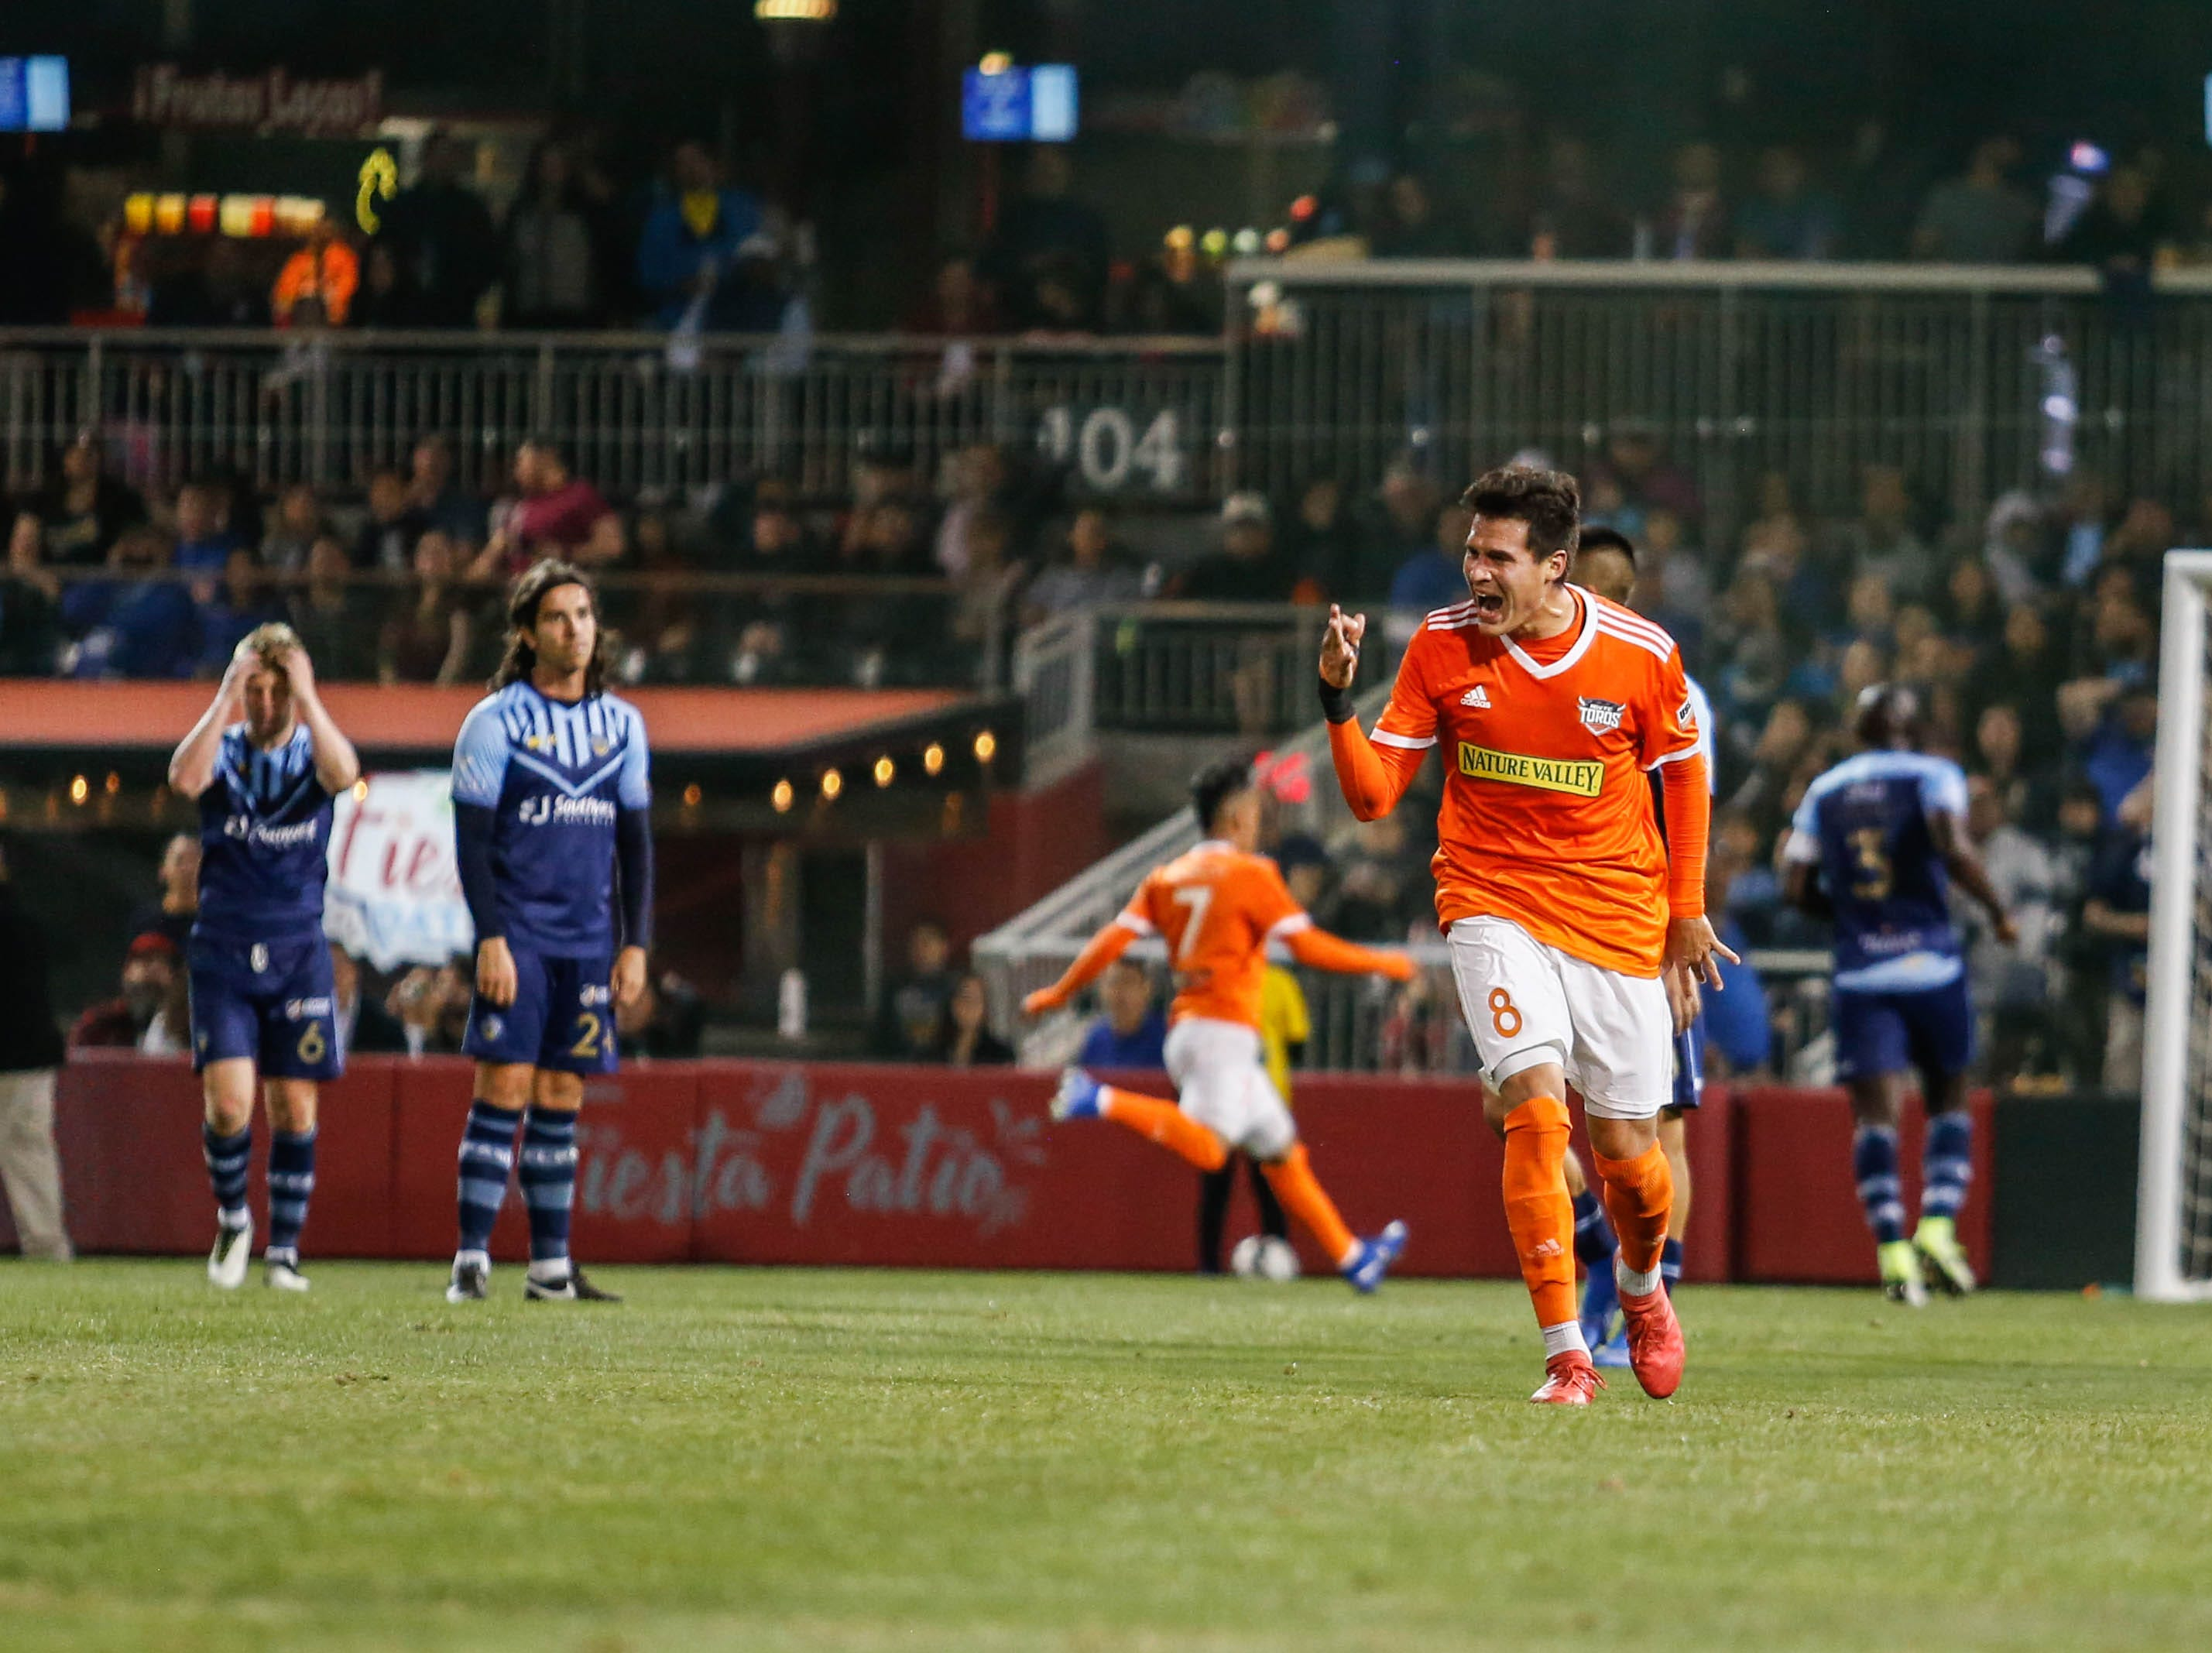 Rio Grande Valley defender Romilio Hernandez celebrates his first goal of the night against the El Paso Locomotive.